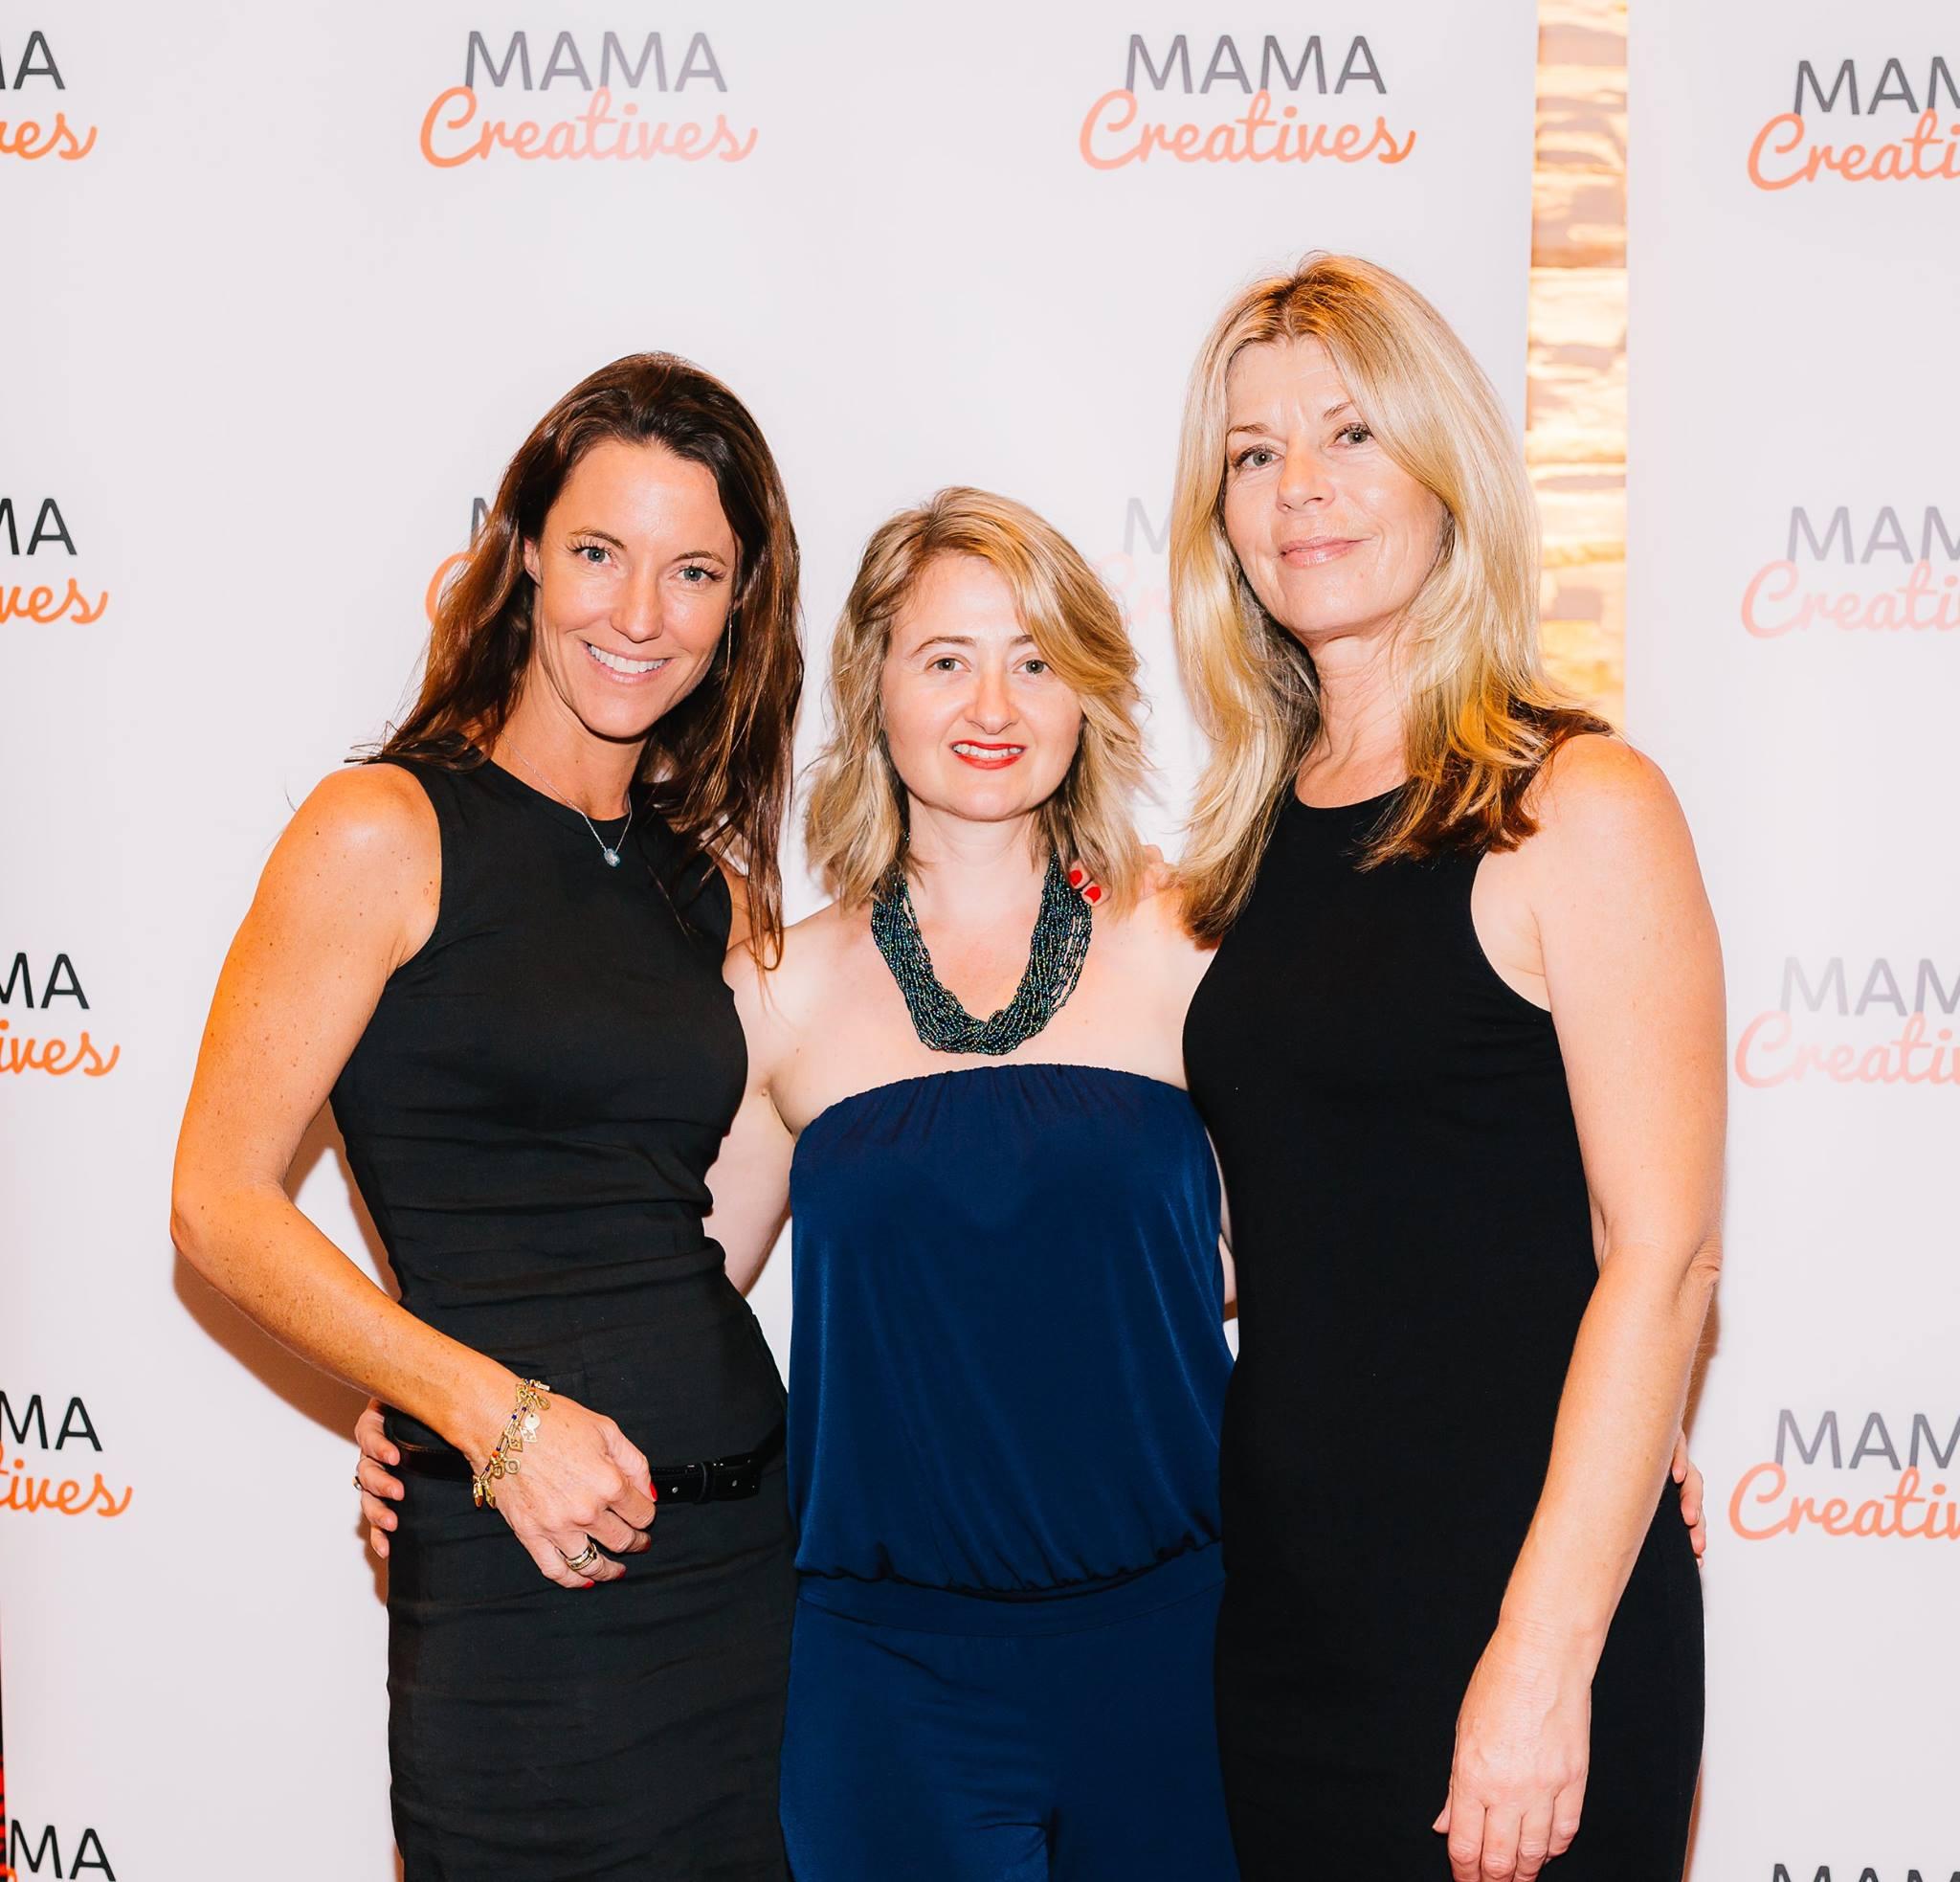 With two very special creative mamas, Anna Kellerman and Sharon de Souza.